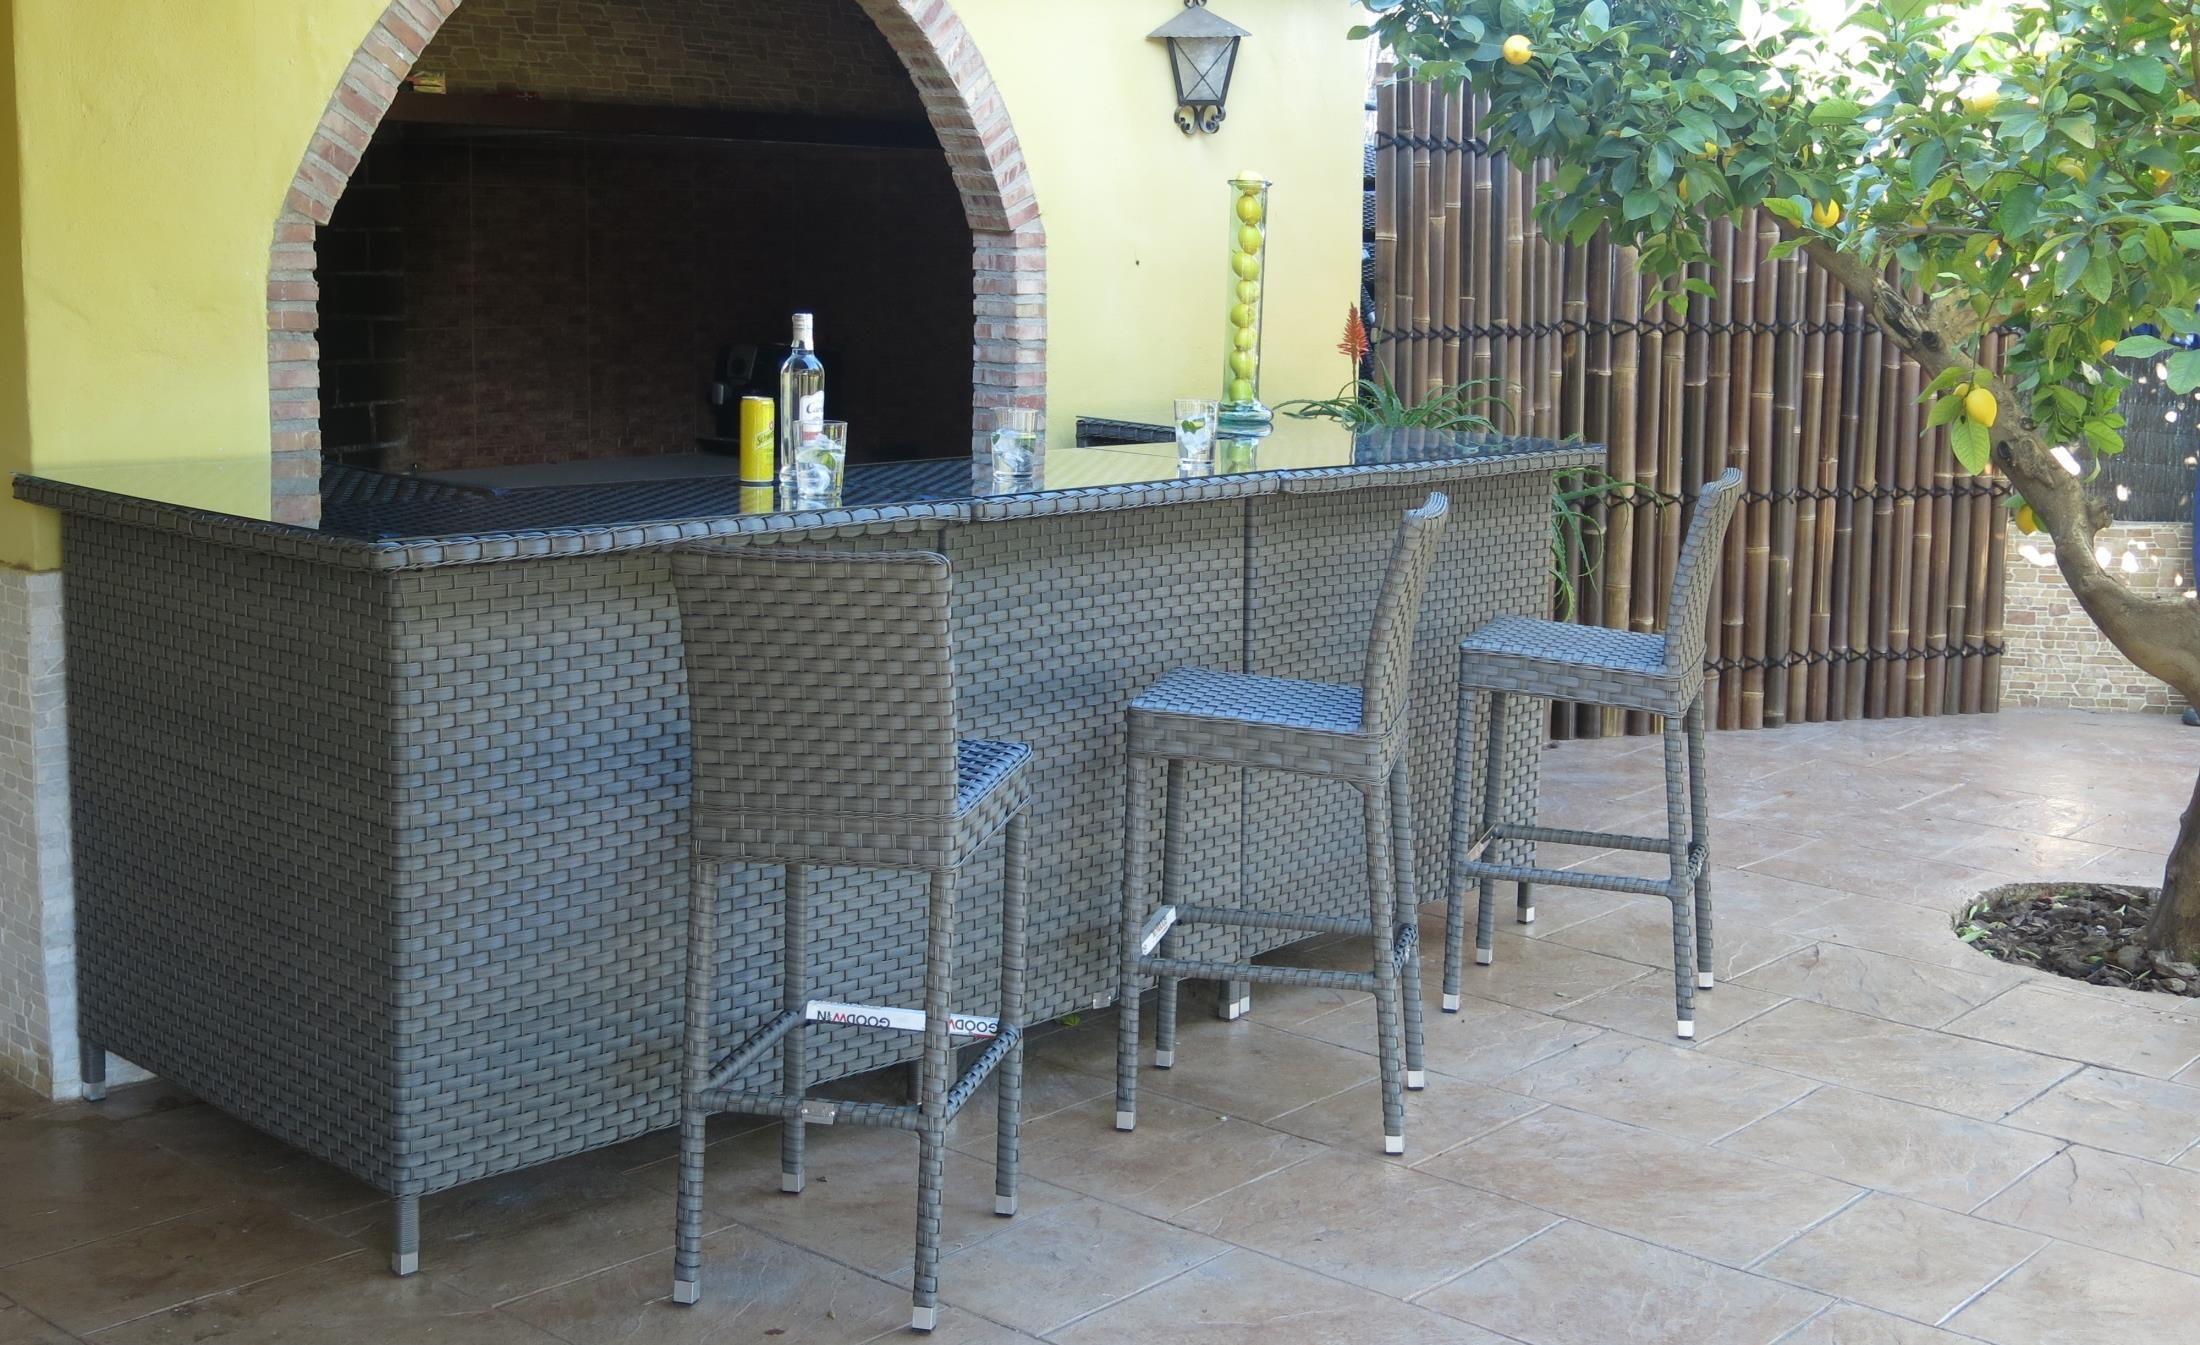 Barra Bar Exterior Www Jardinter Com Minimalismo Decoracion Boda En Jardin Barra De Bar